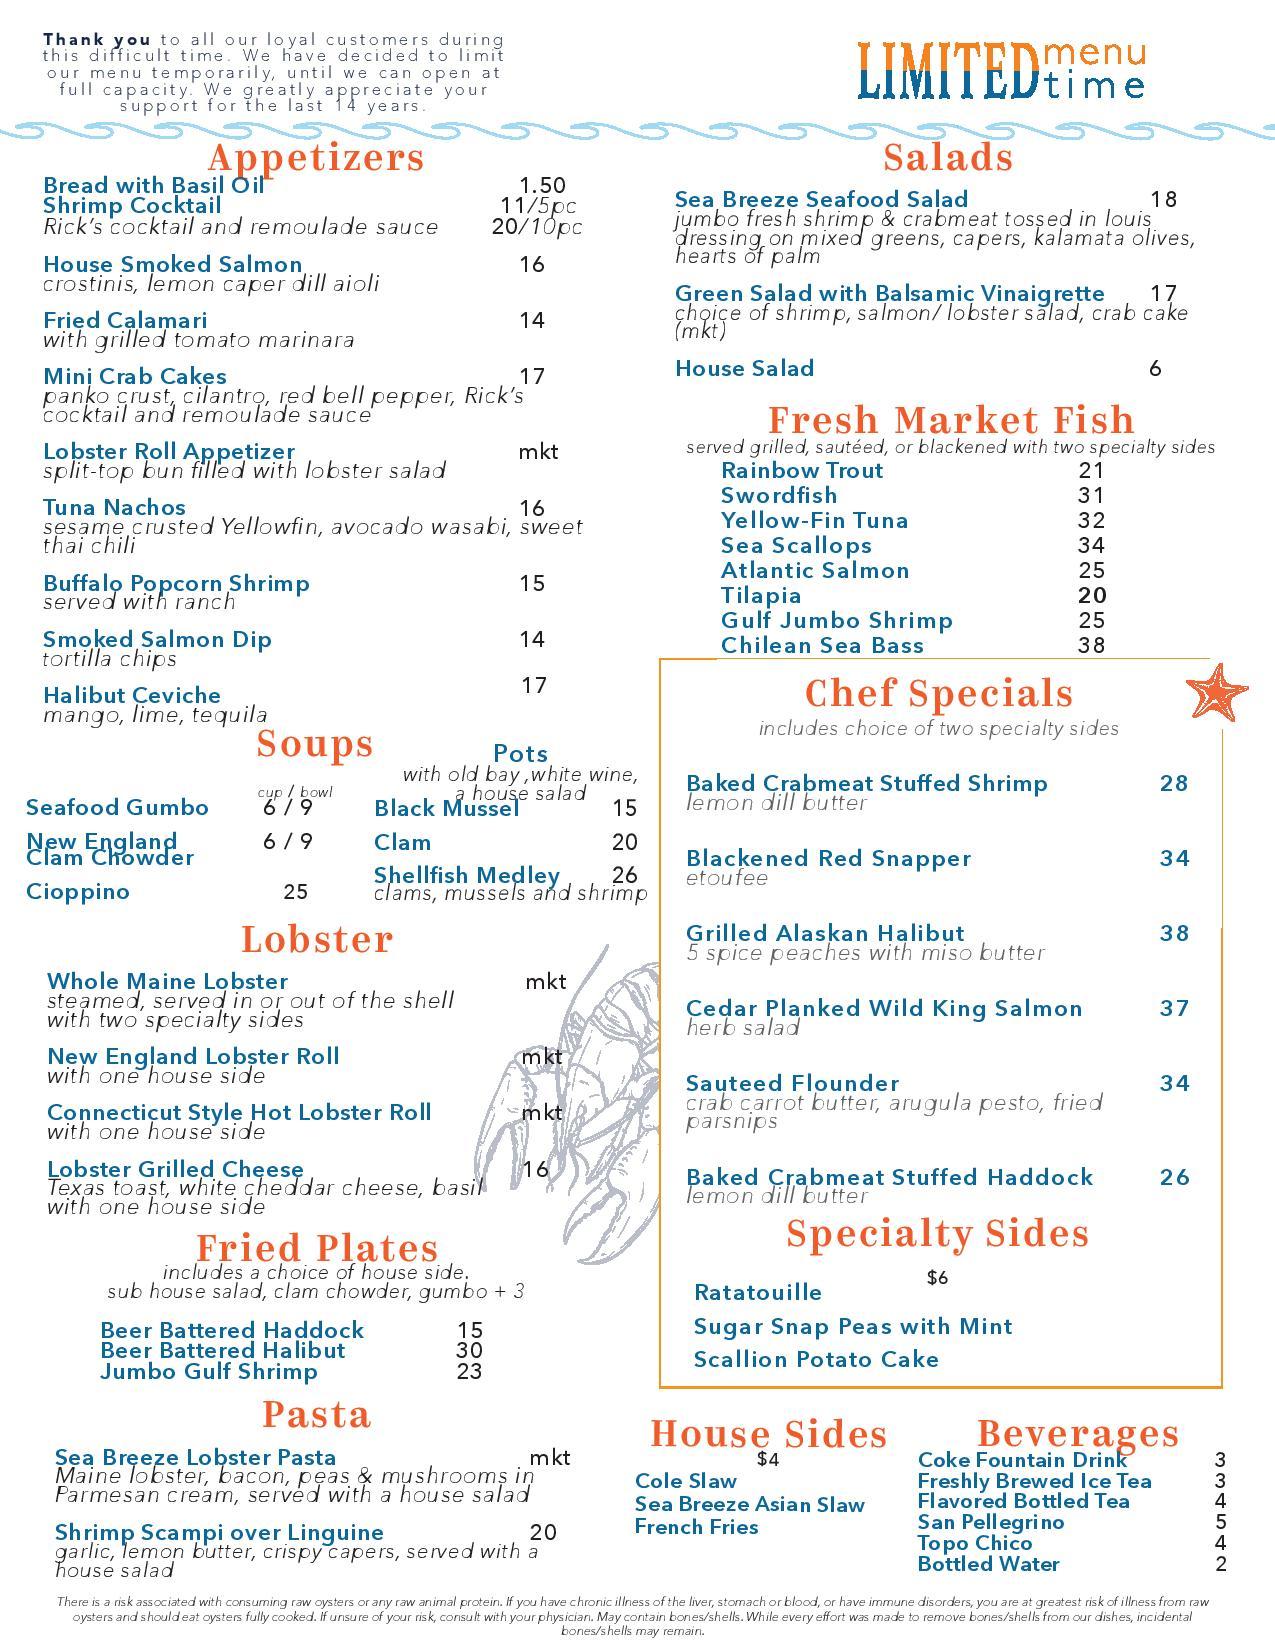 7.15 new menu